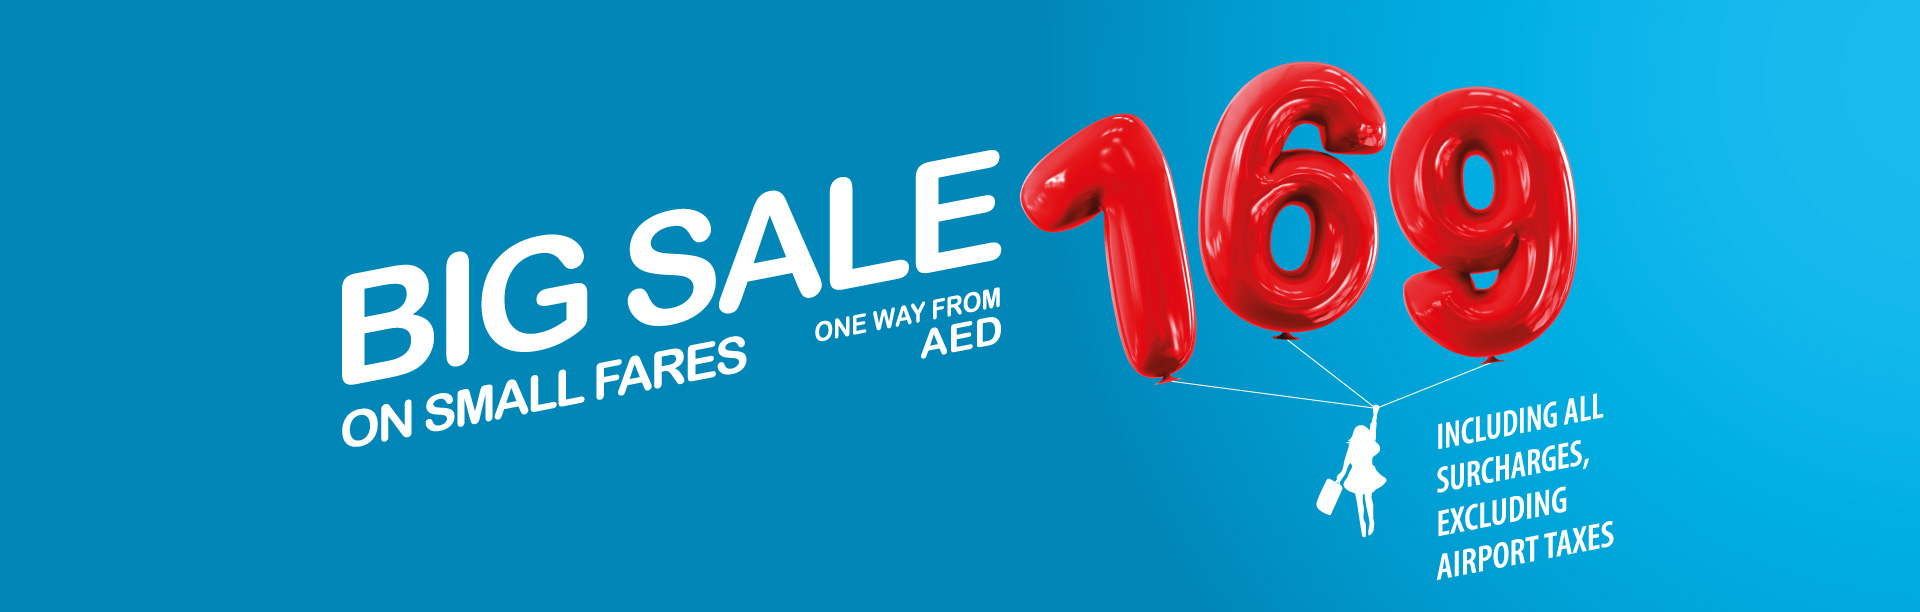 Big Sale On Small Fares | Air Arabia